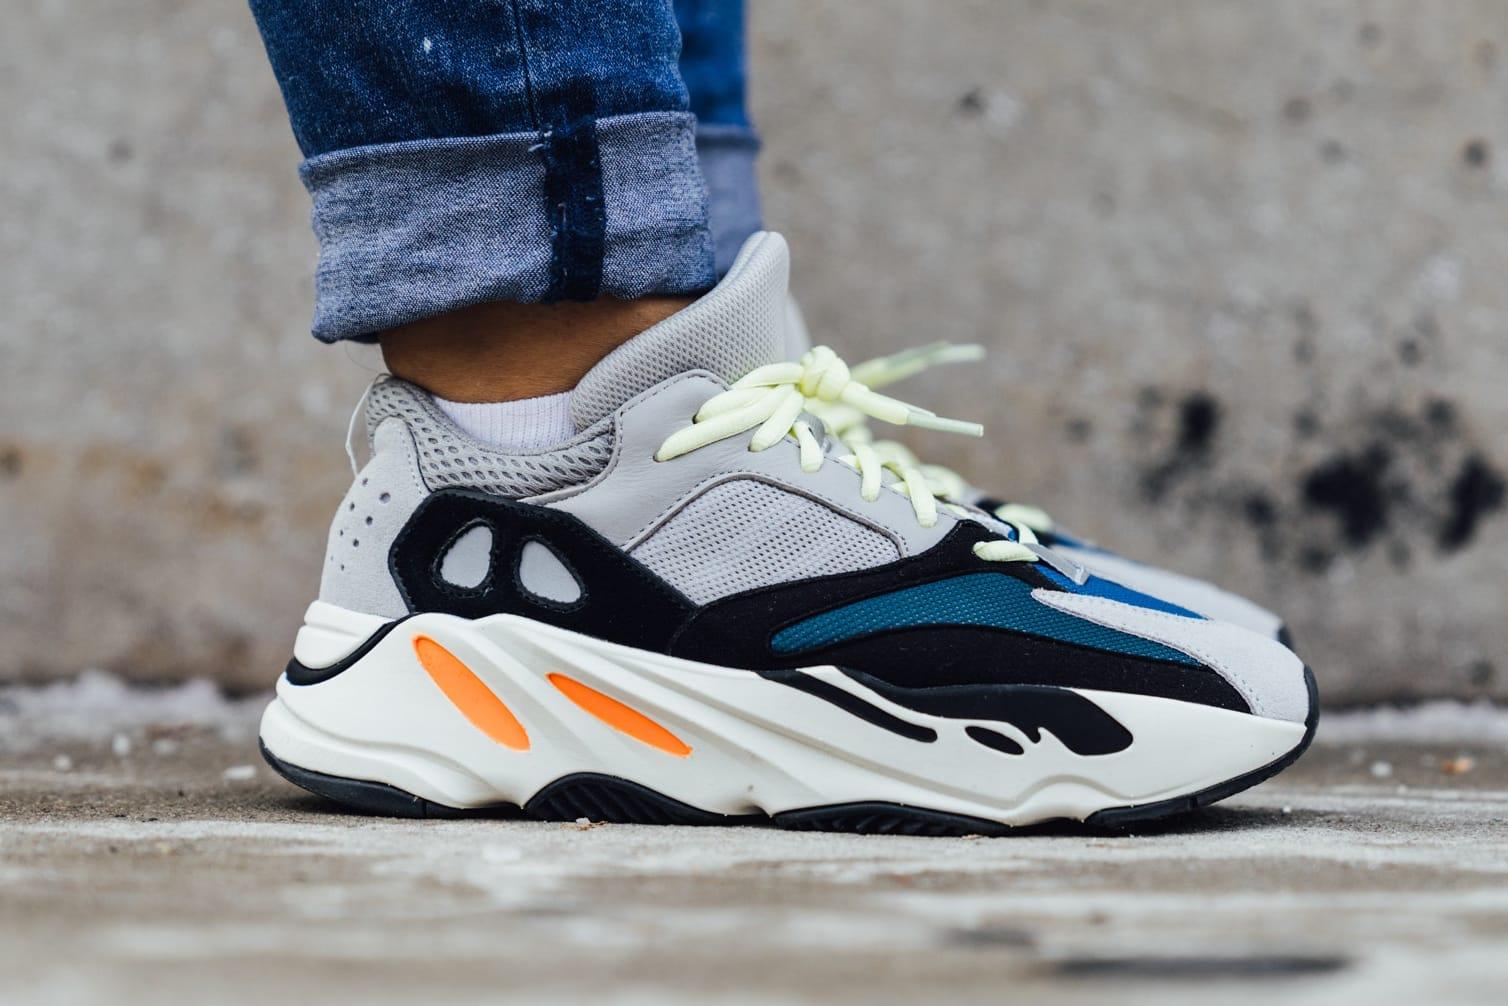 YEEZY Wave Runner 700 Sneaker Global Re